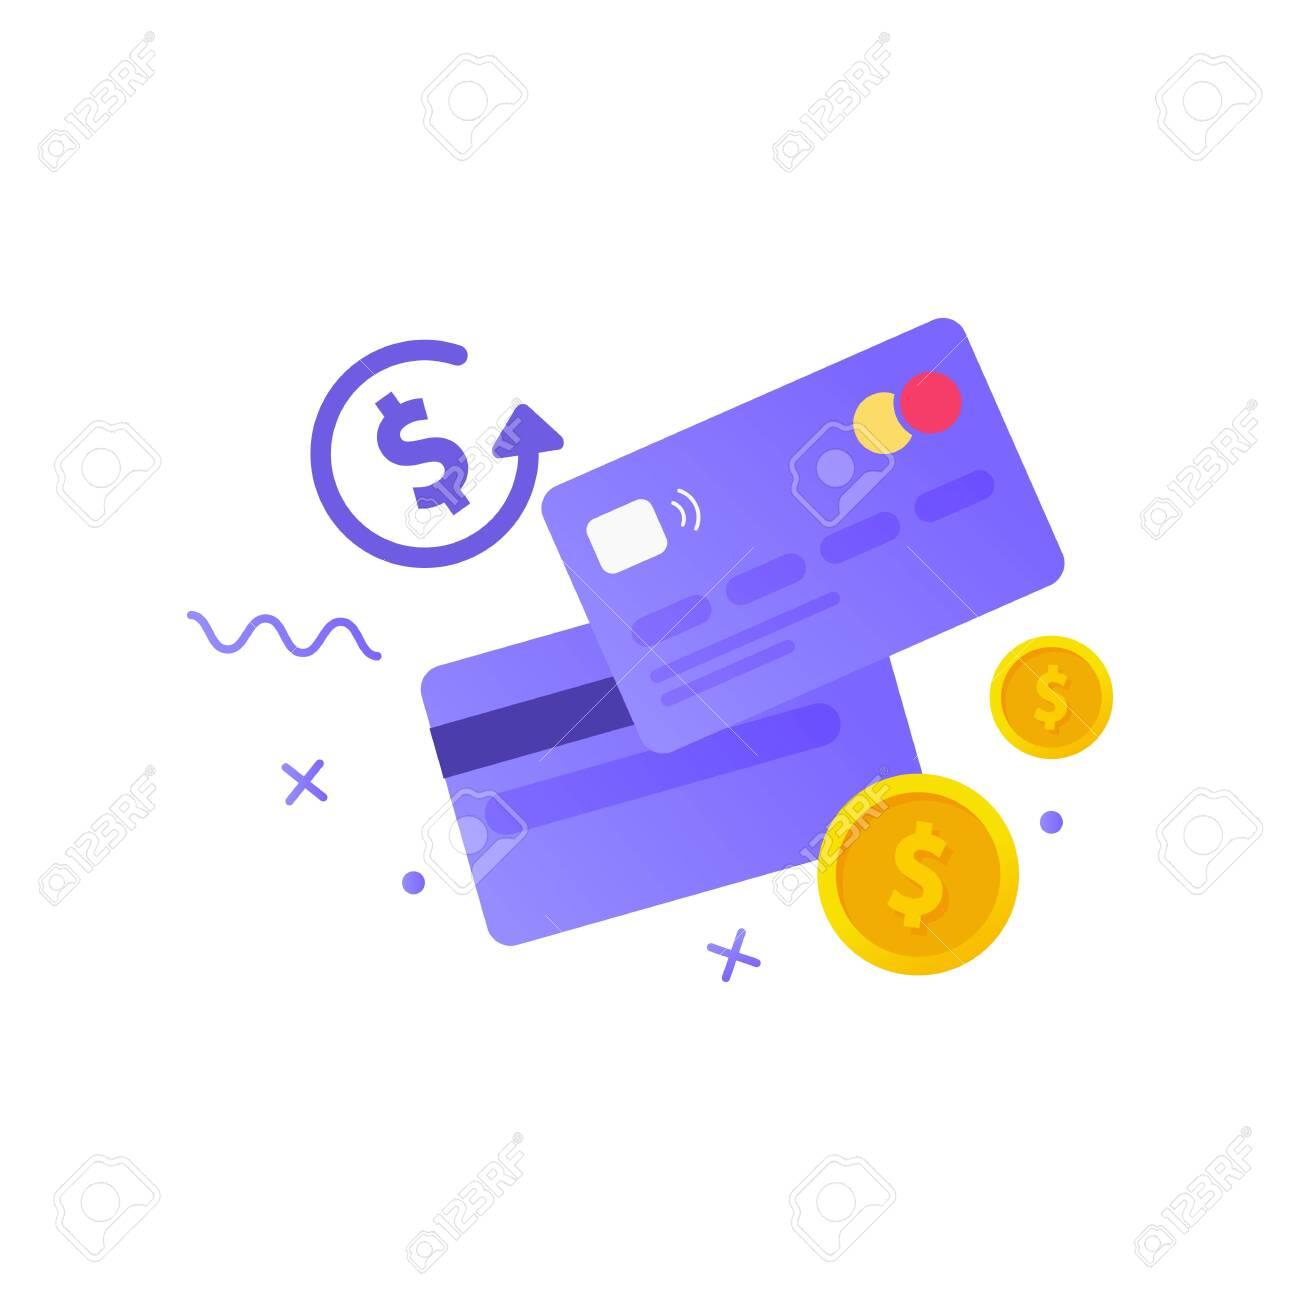 Credit card simple icon. Money. Vector illustration - 148299103